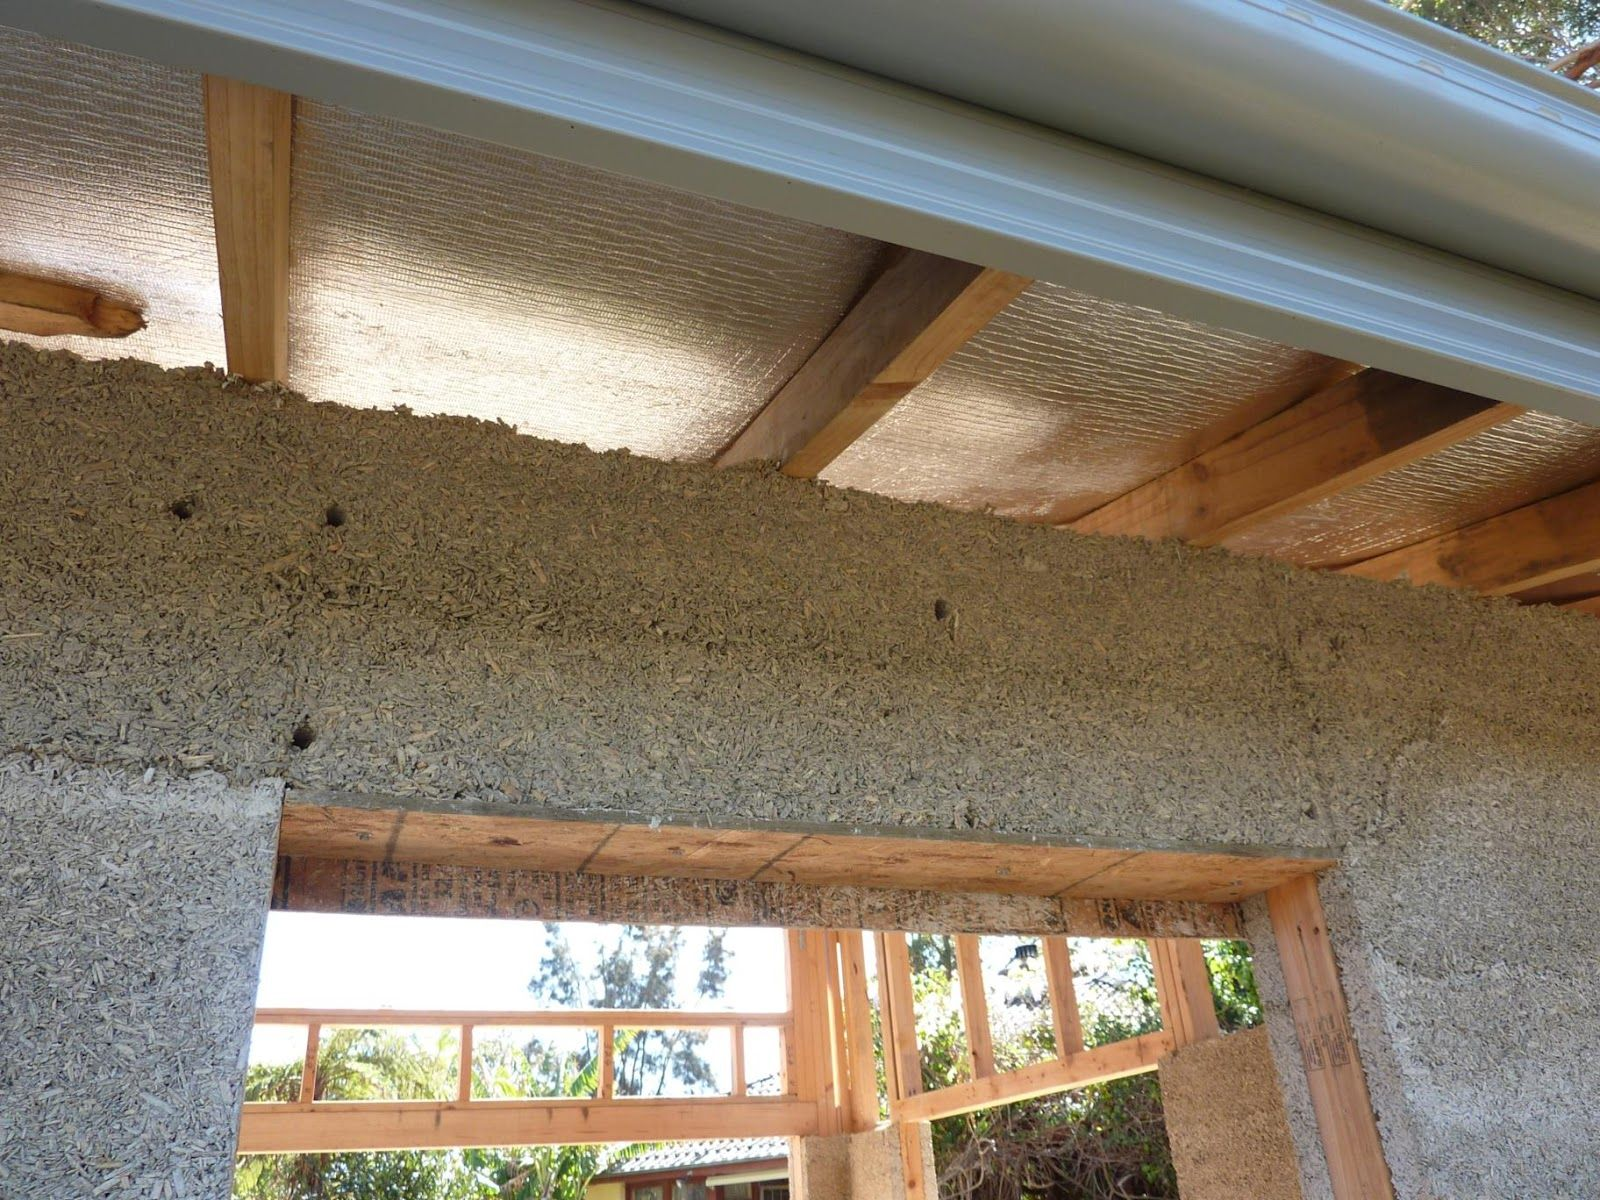 Culburra Hemp House Hemping Timber Lintels And Up To Ceiling Height Timber Ceiling Height Building A House